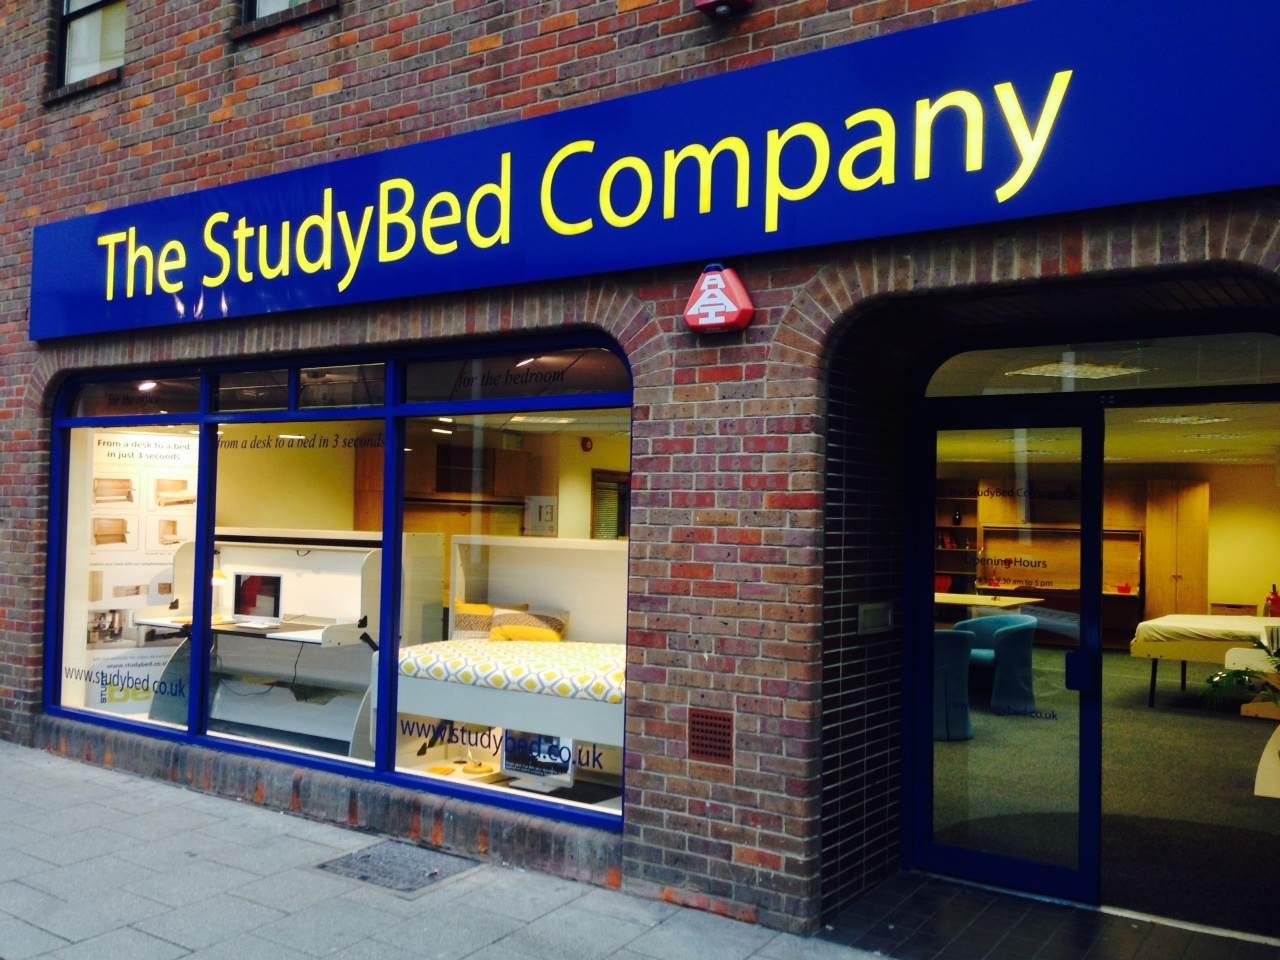 StudyBed - Desk and Bed combination - Deskbed